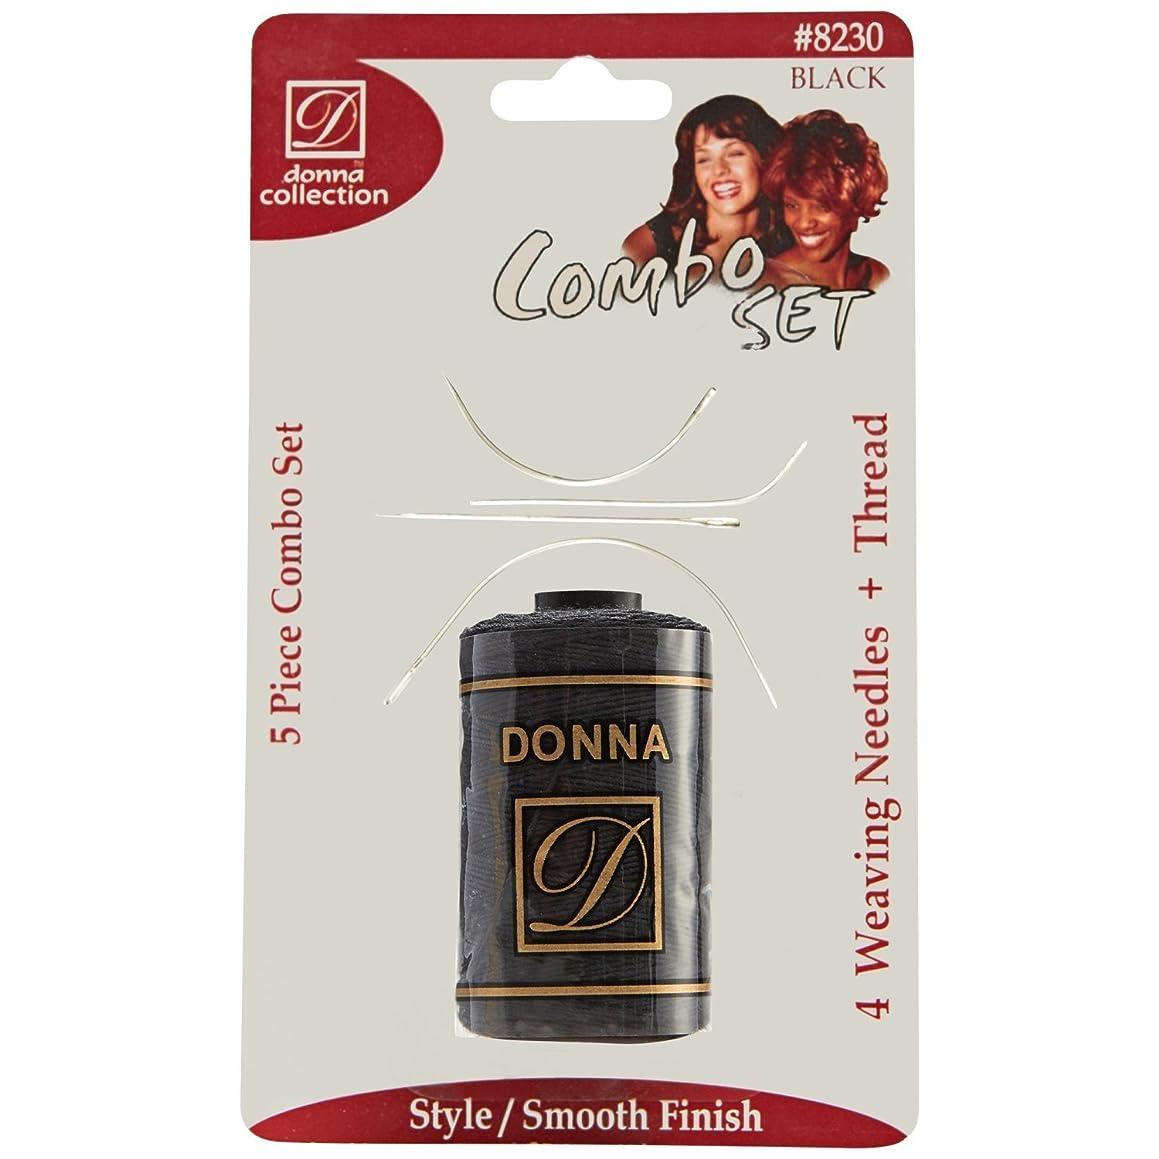 Donna Collection Black Weaving Thread & Needle Set